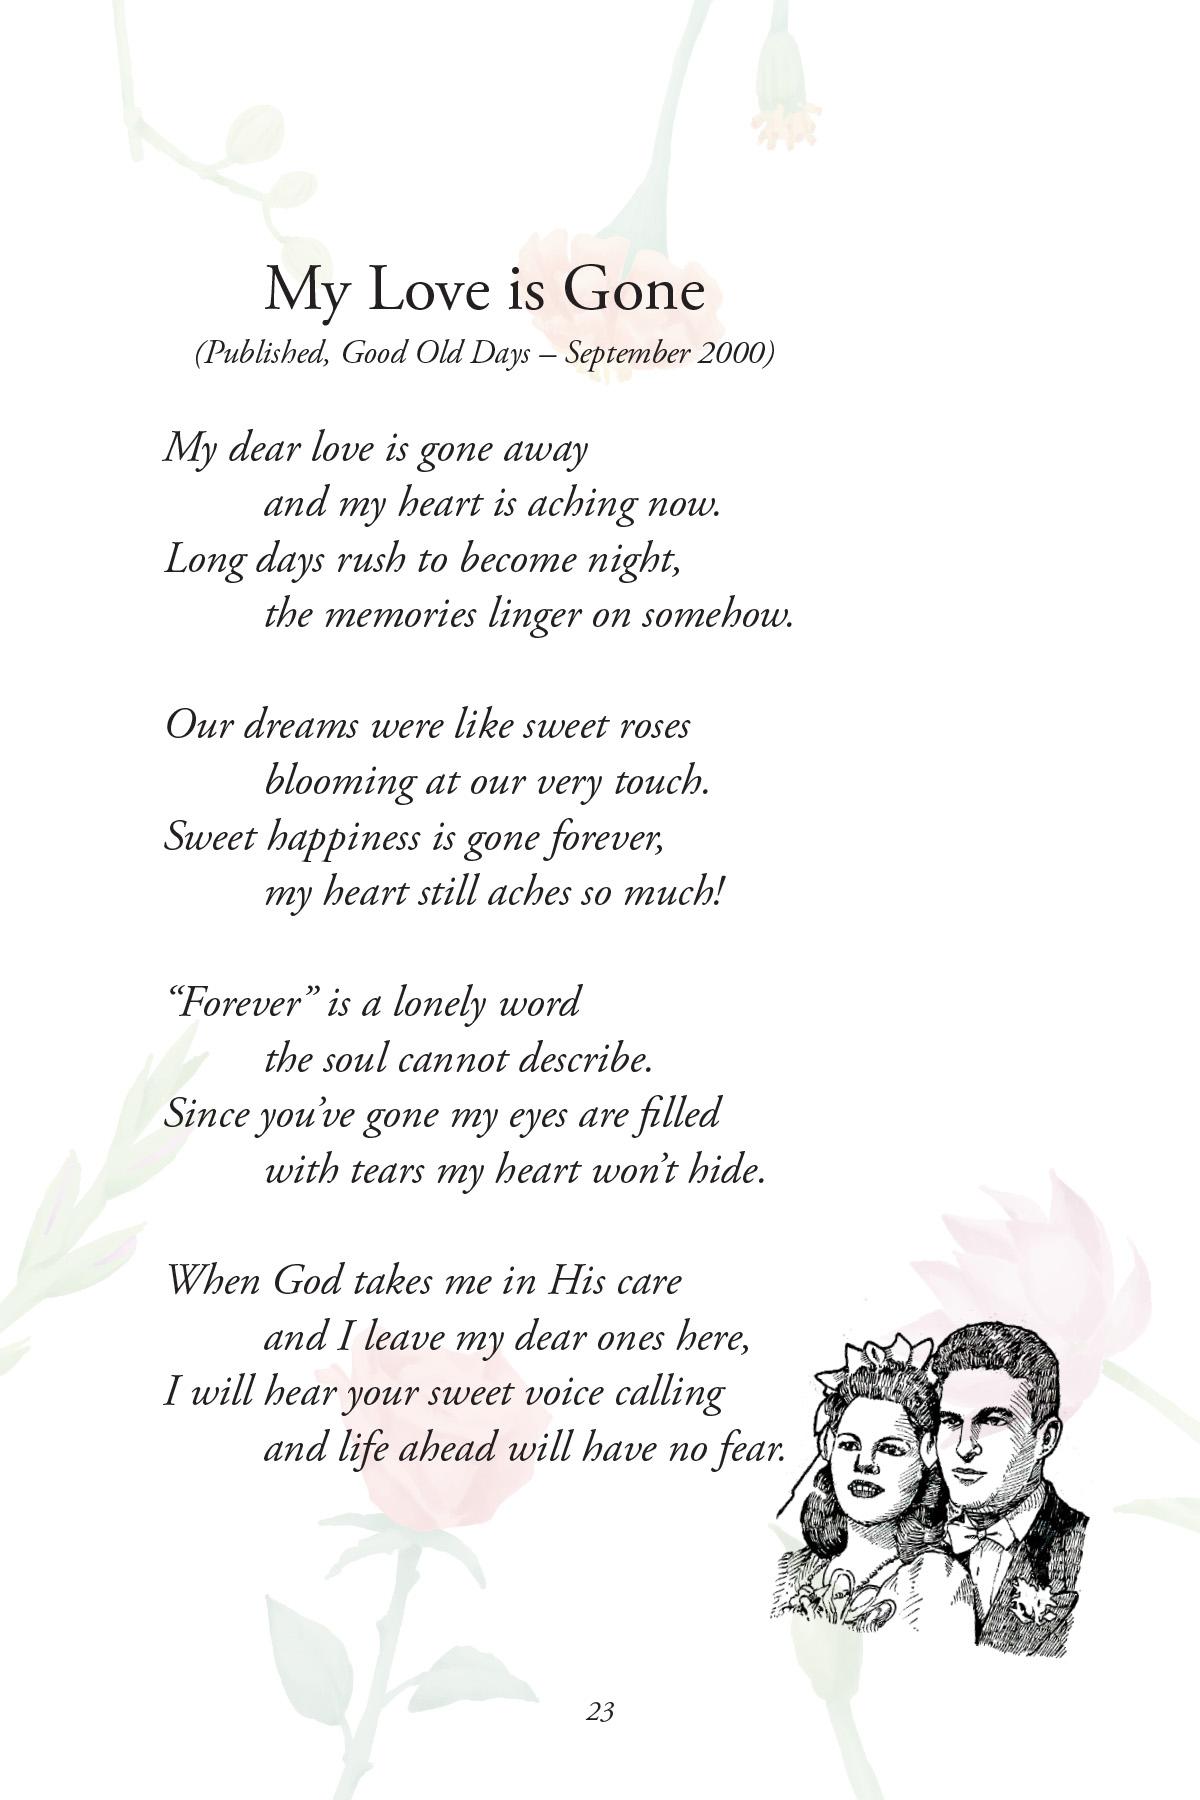 MyLittleBookOfPoetry_Layout_Poem-MyLoveIsGone-WEB